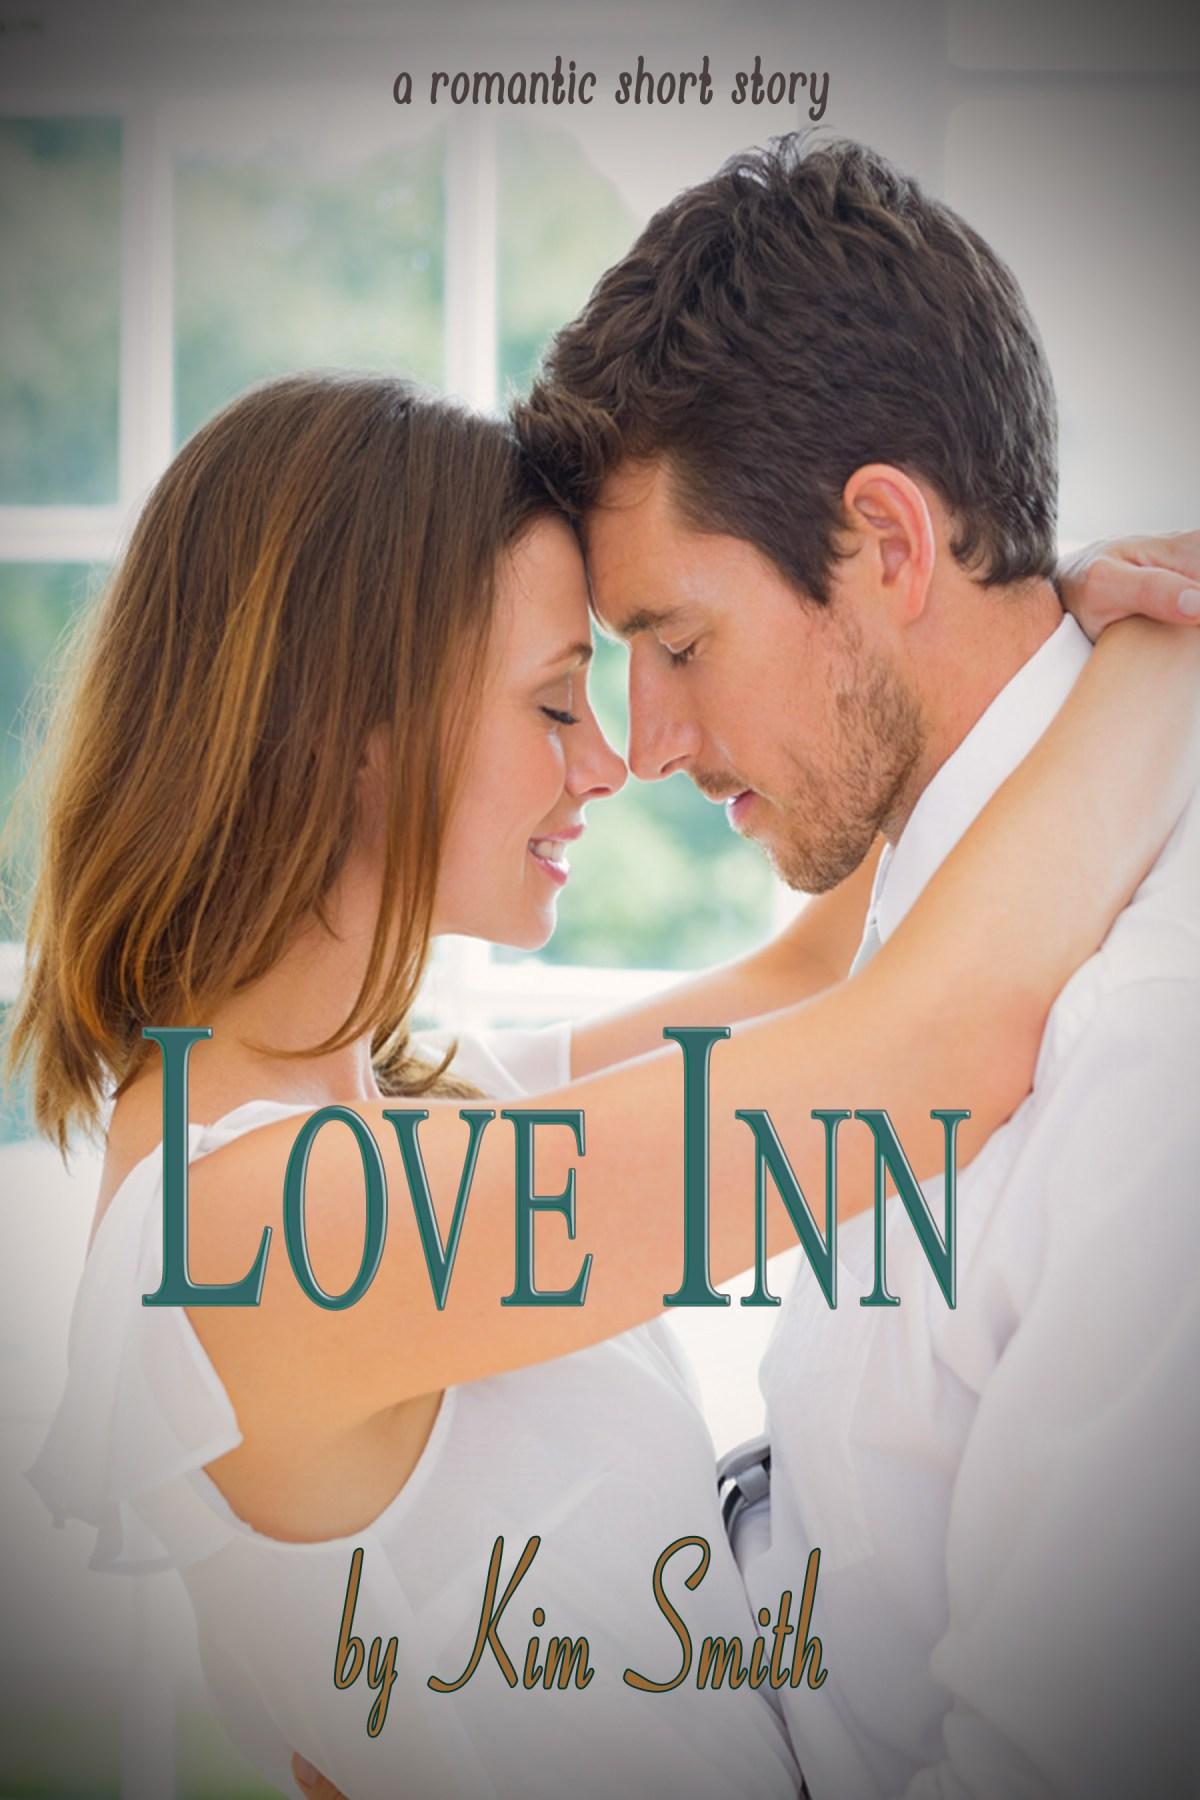 LOVE INN – A romantic short story